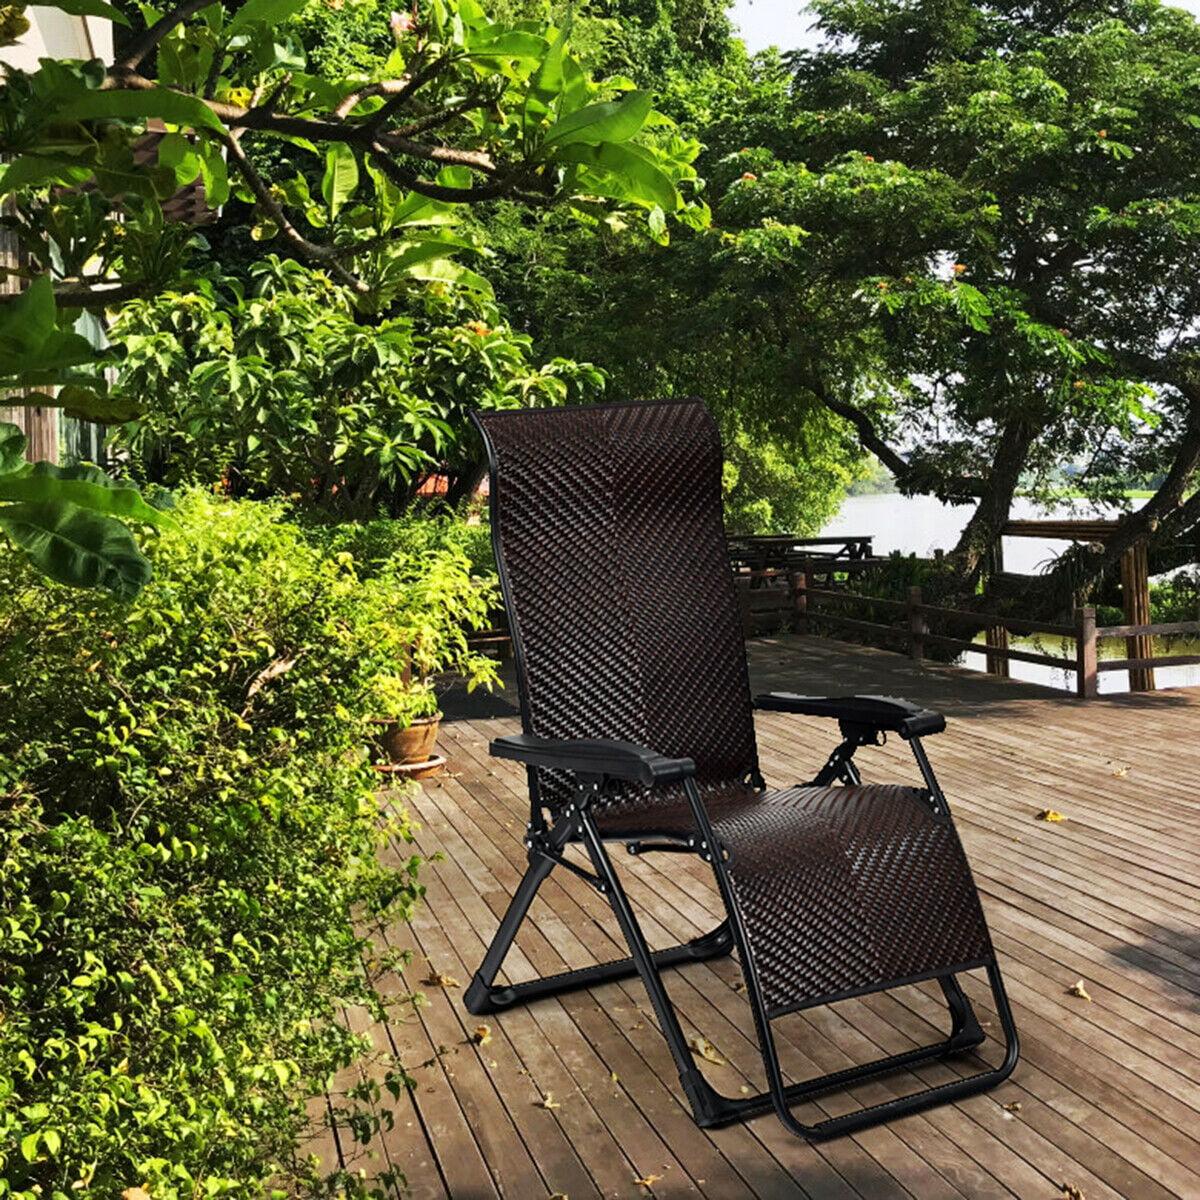 Gymax Patio Rattan Zero Gravity Lounge Chair Folding Recliner Adjustable  W/Headrest